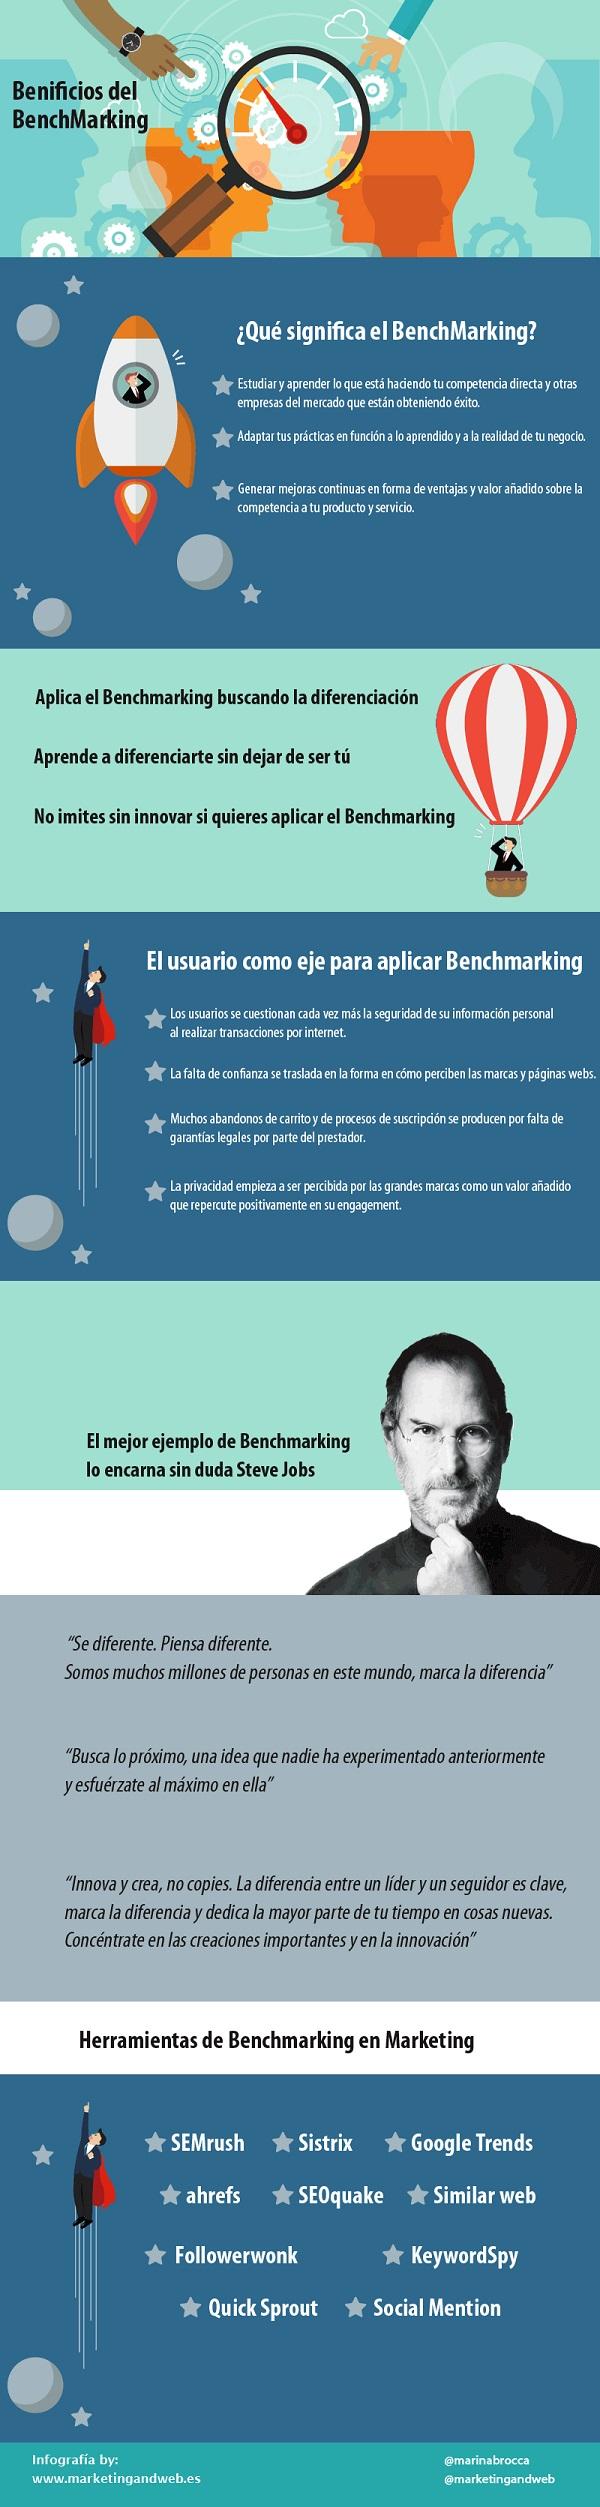 benchmarking-infografia